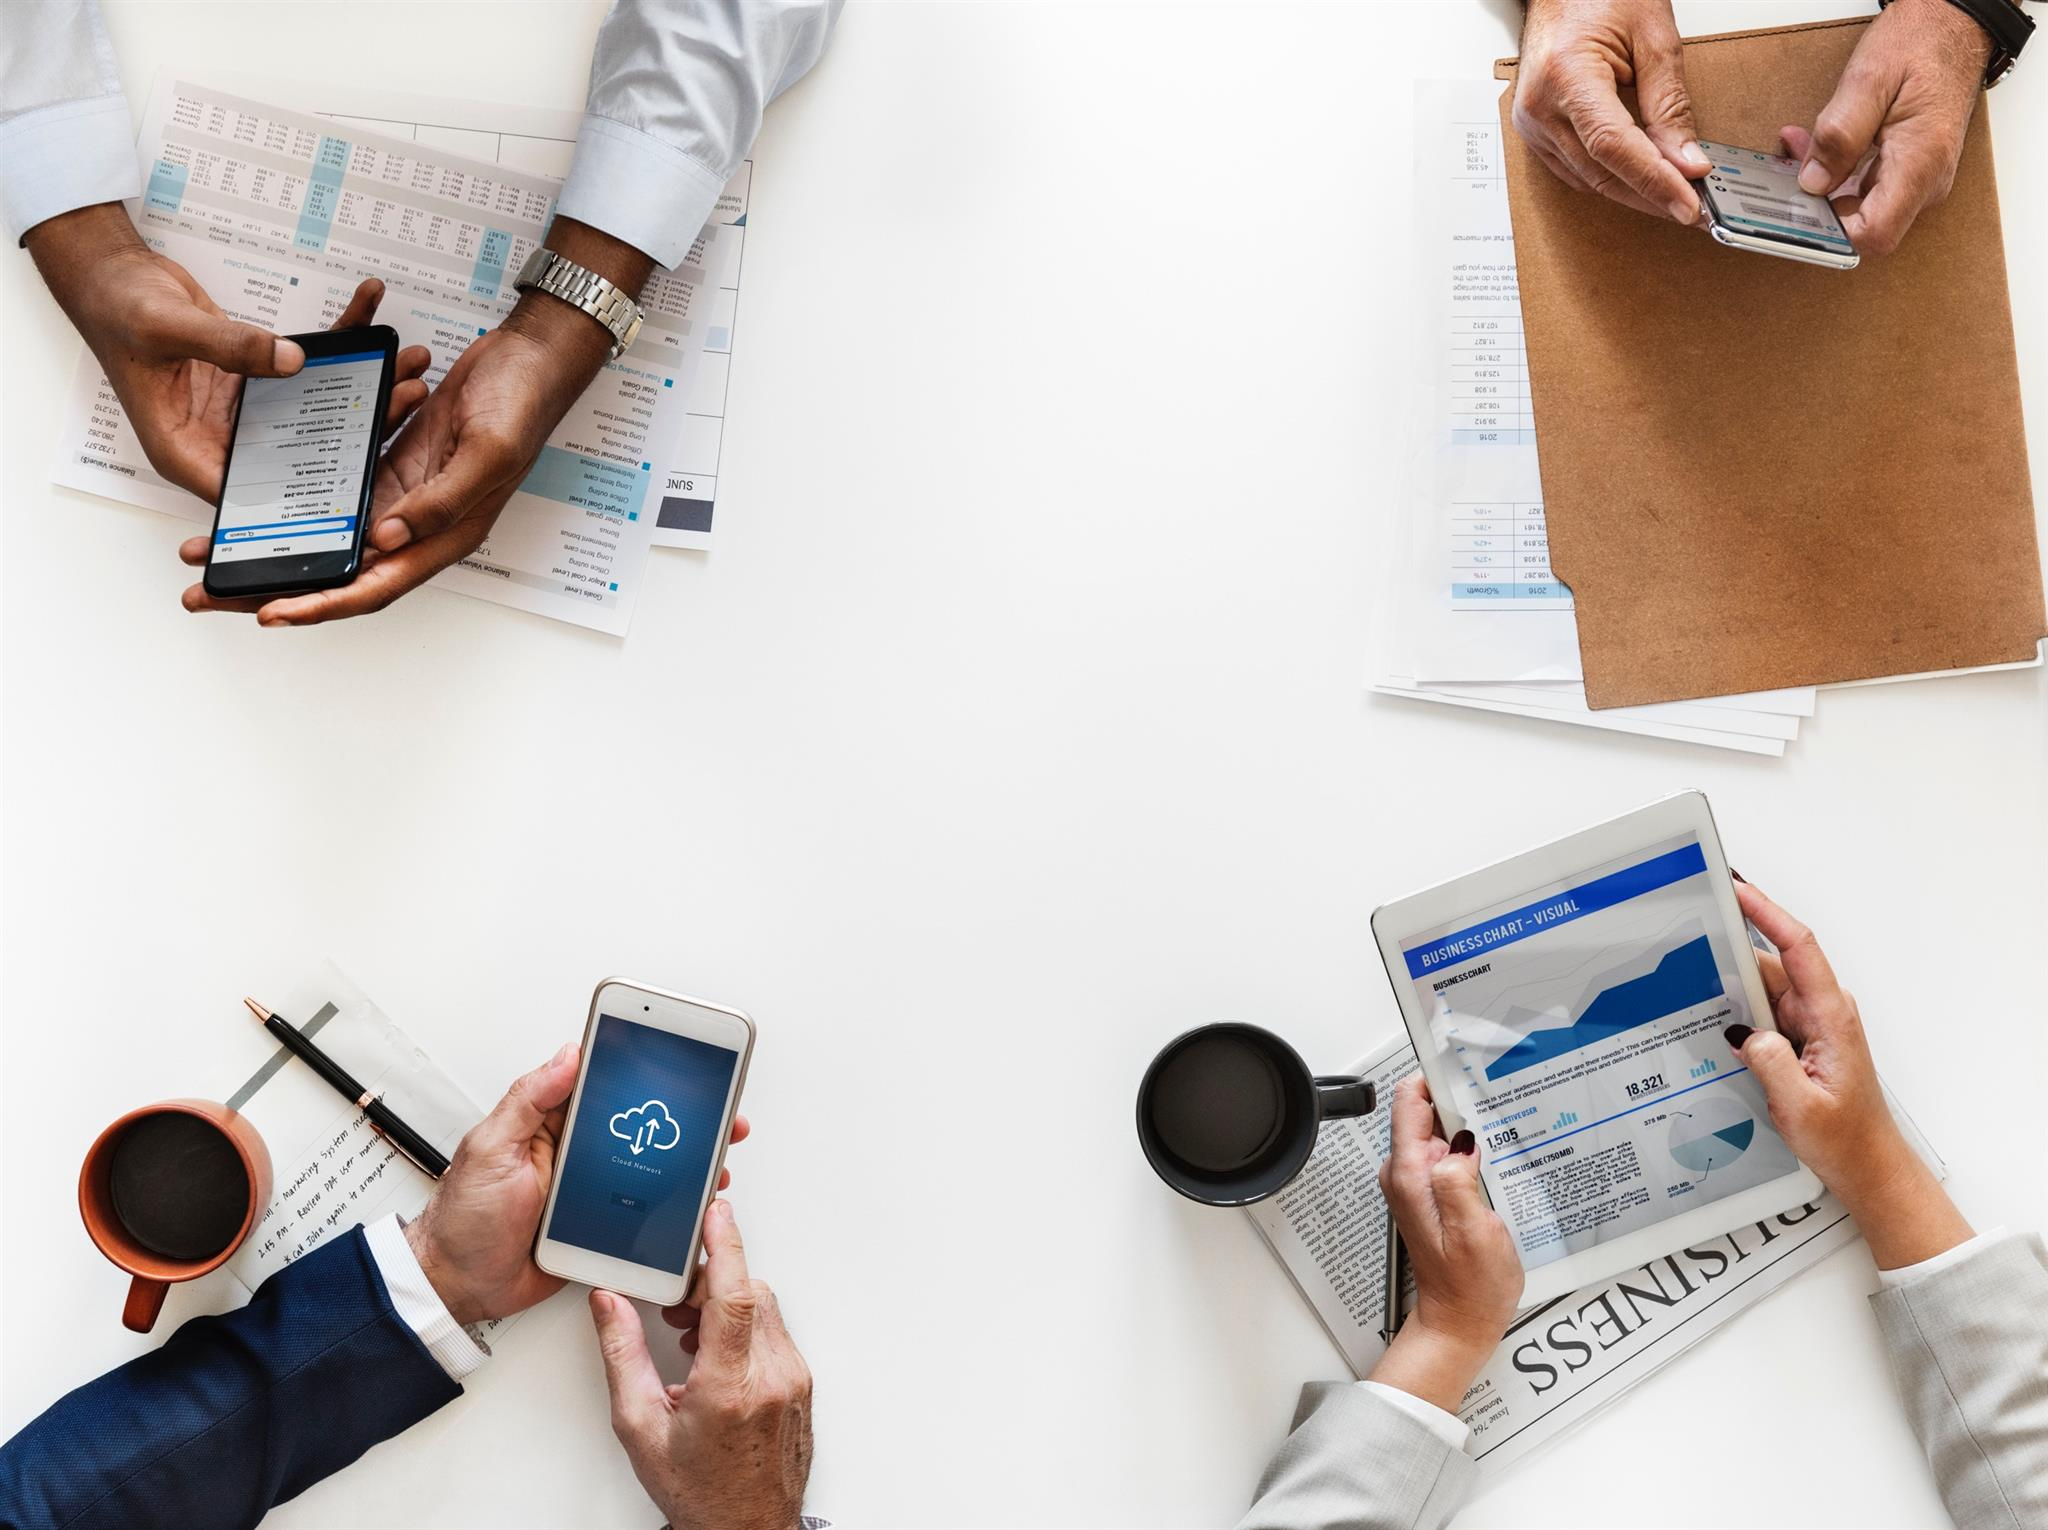 outbound marketing 2018. What is outbound vs inbound marketing?